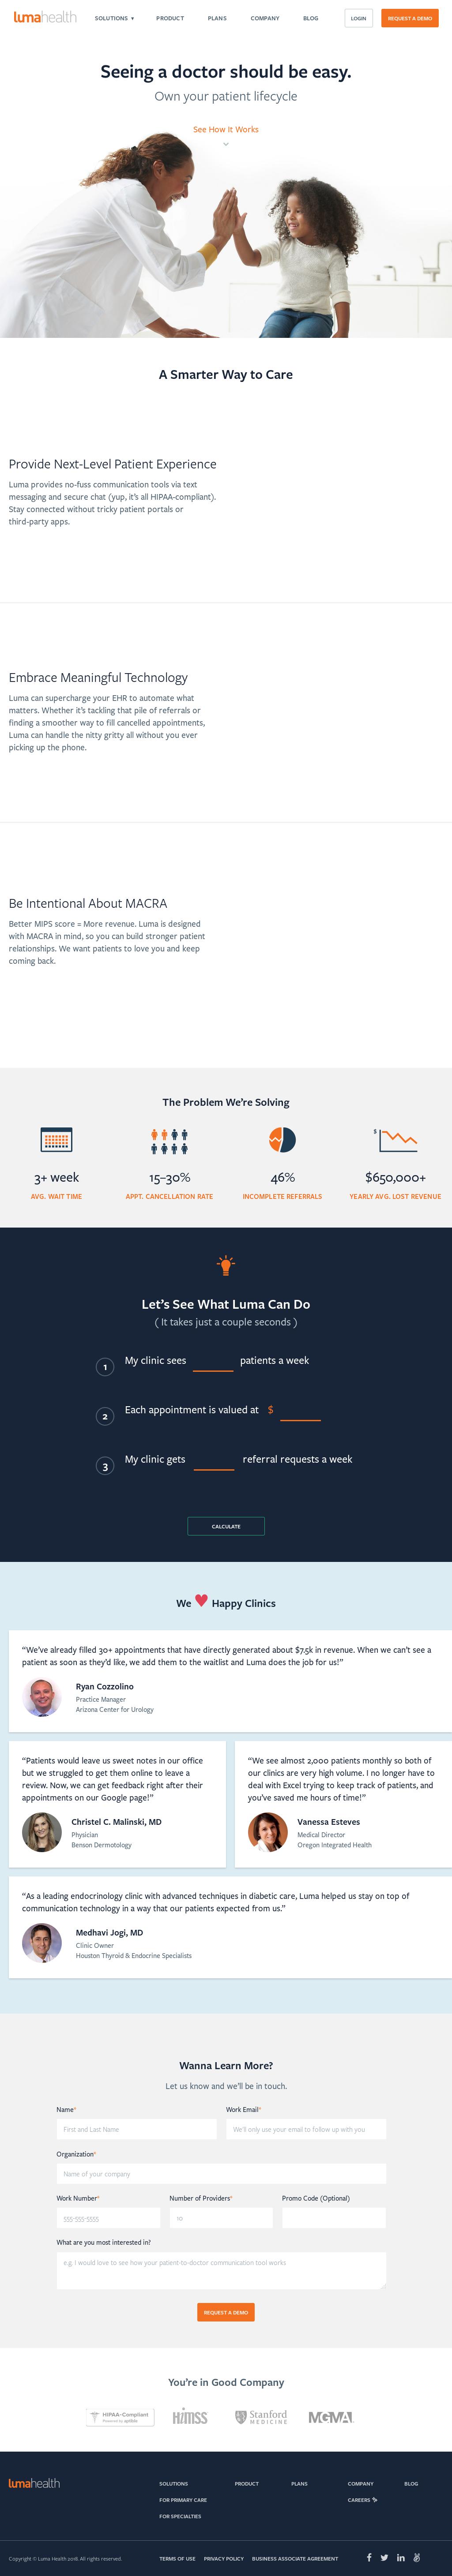 Luma Health Competitors, Revenue and Employees - Owler